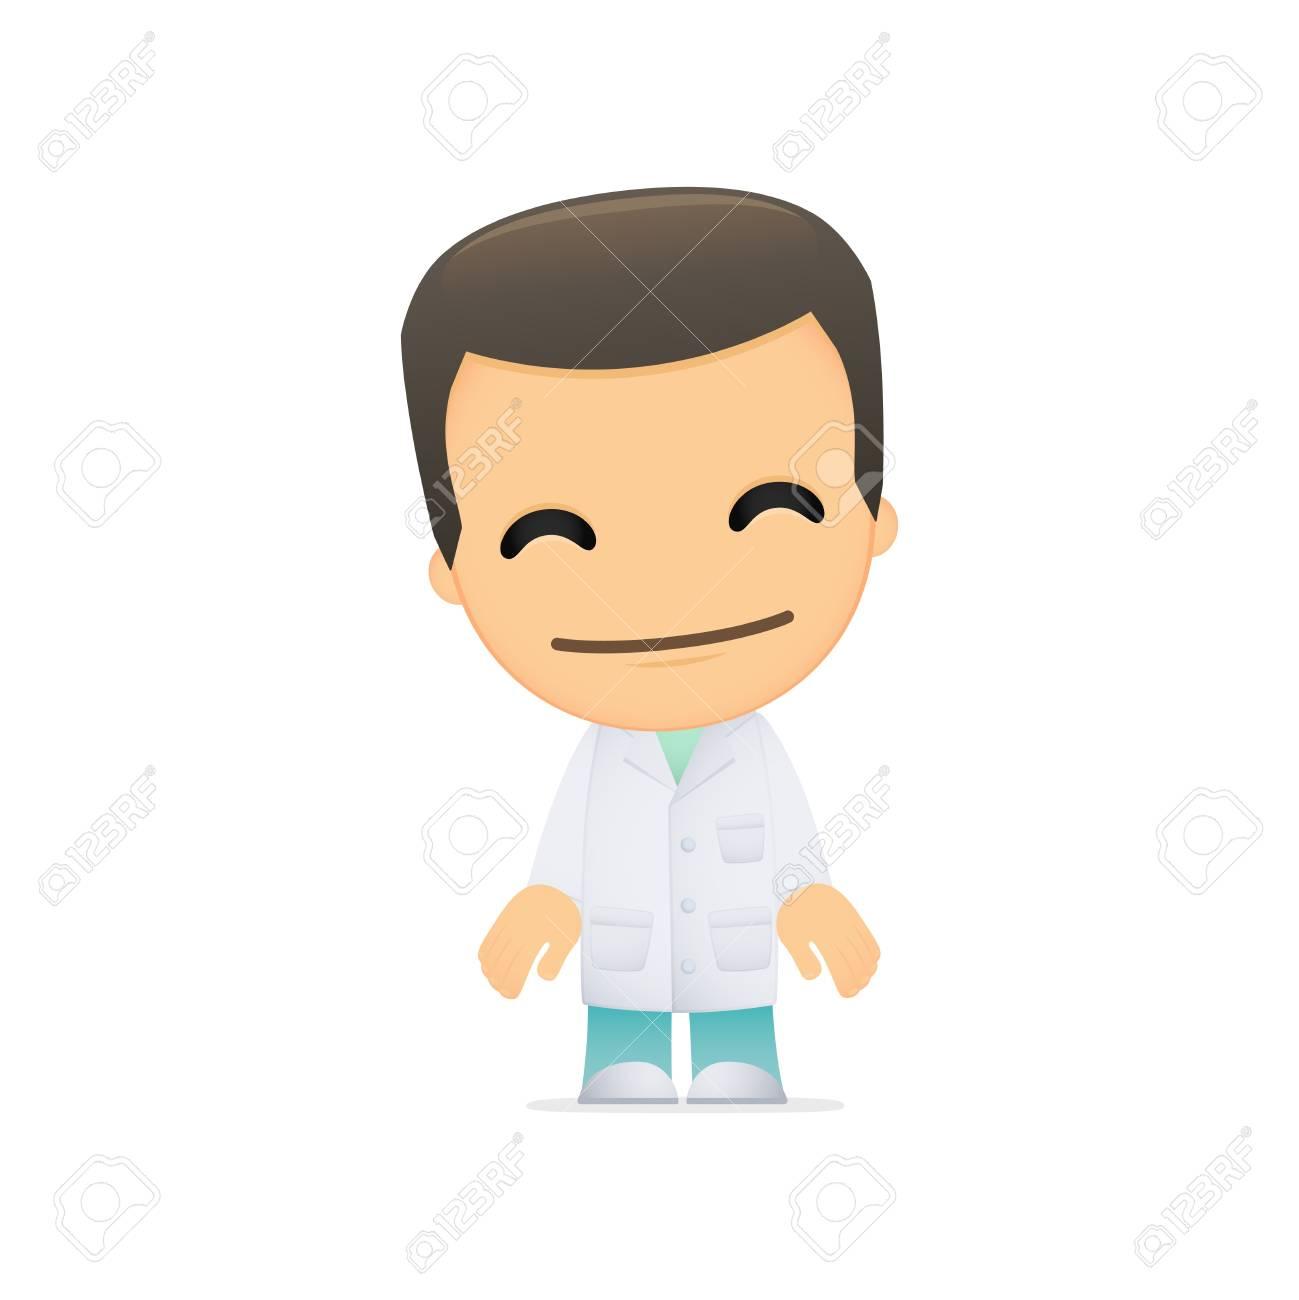 funny cartoon doctor Stock Vector - 13844918